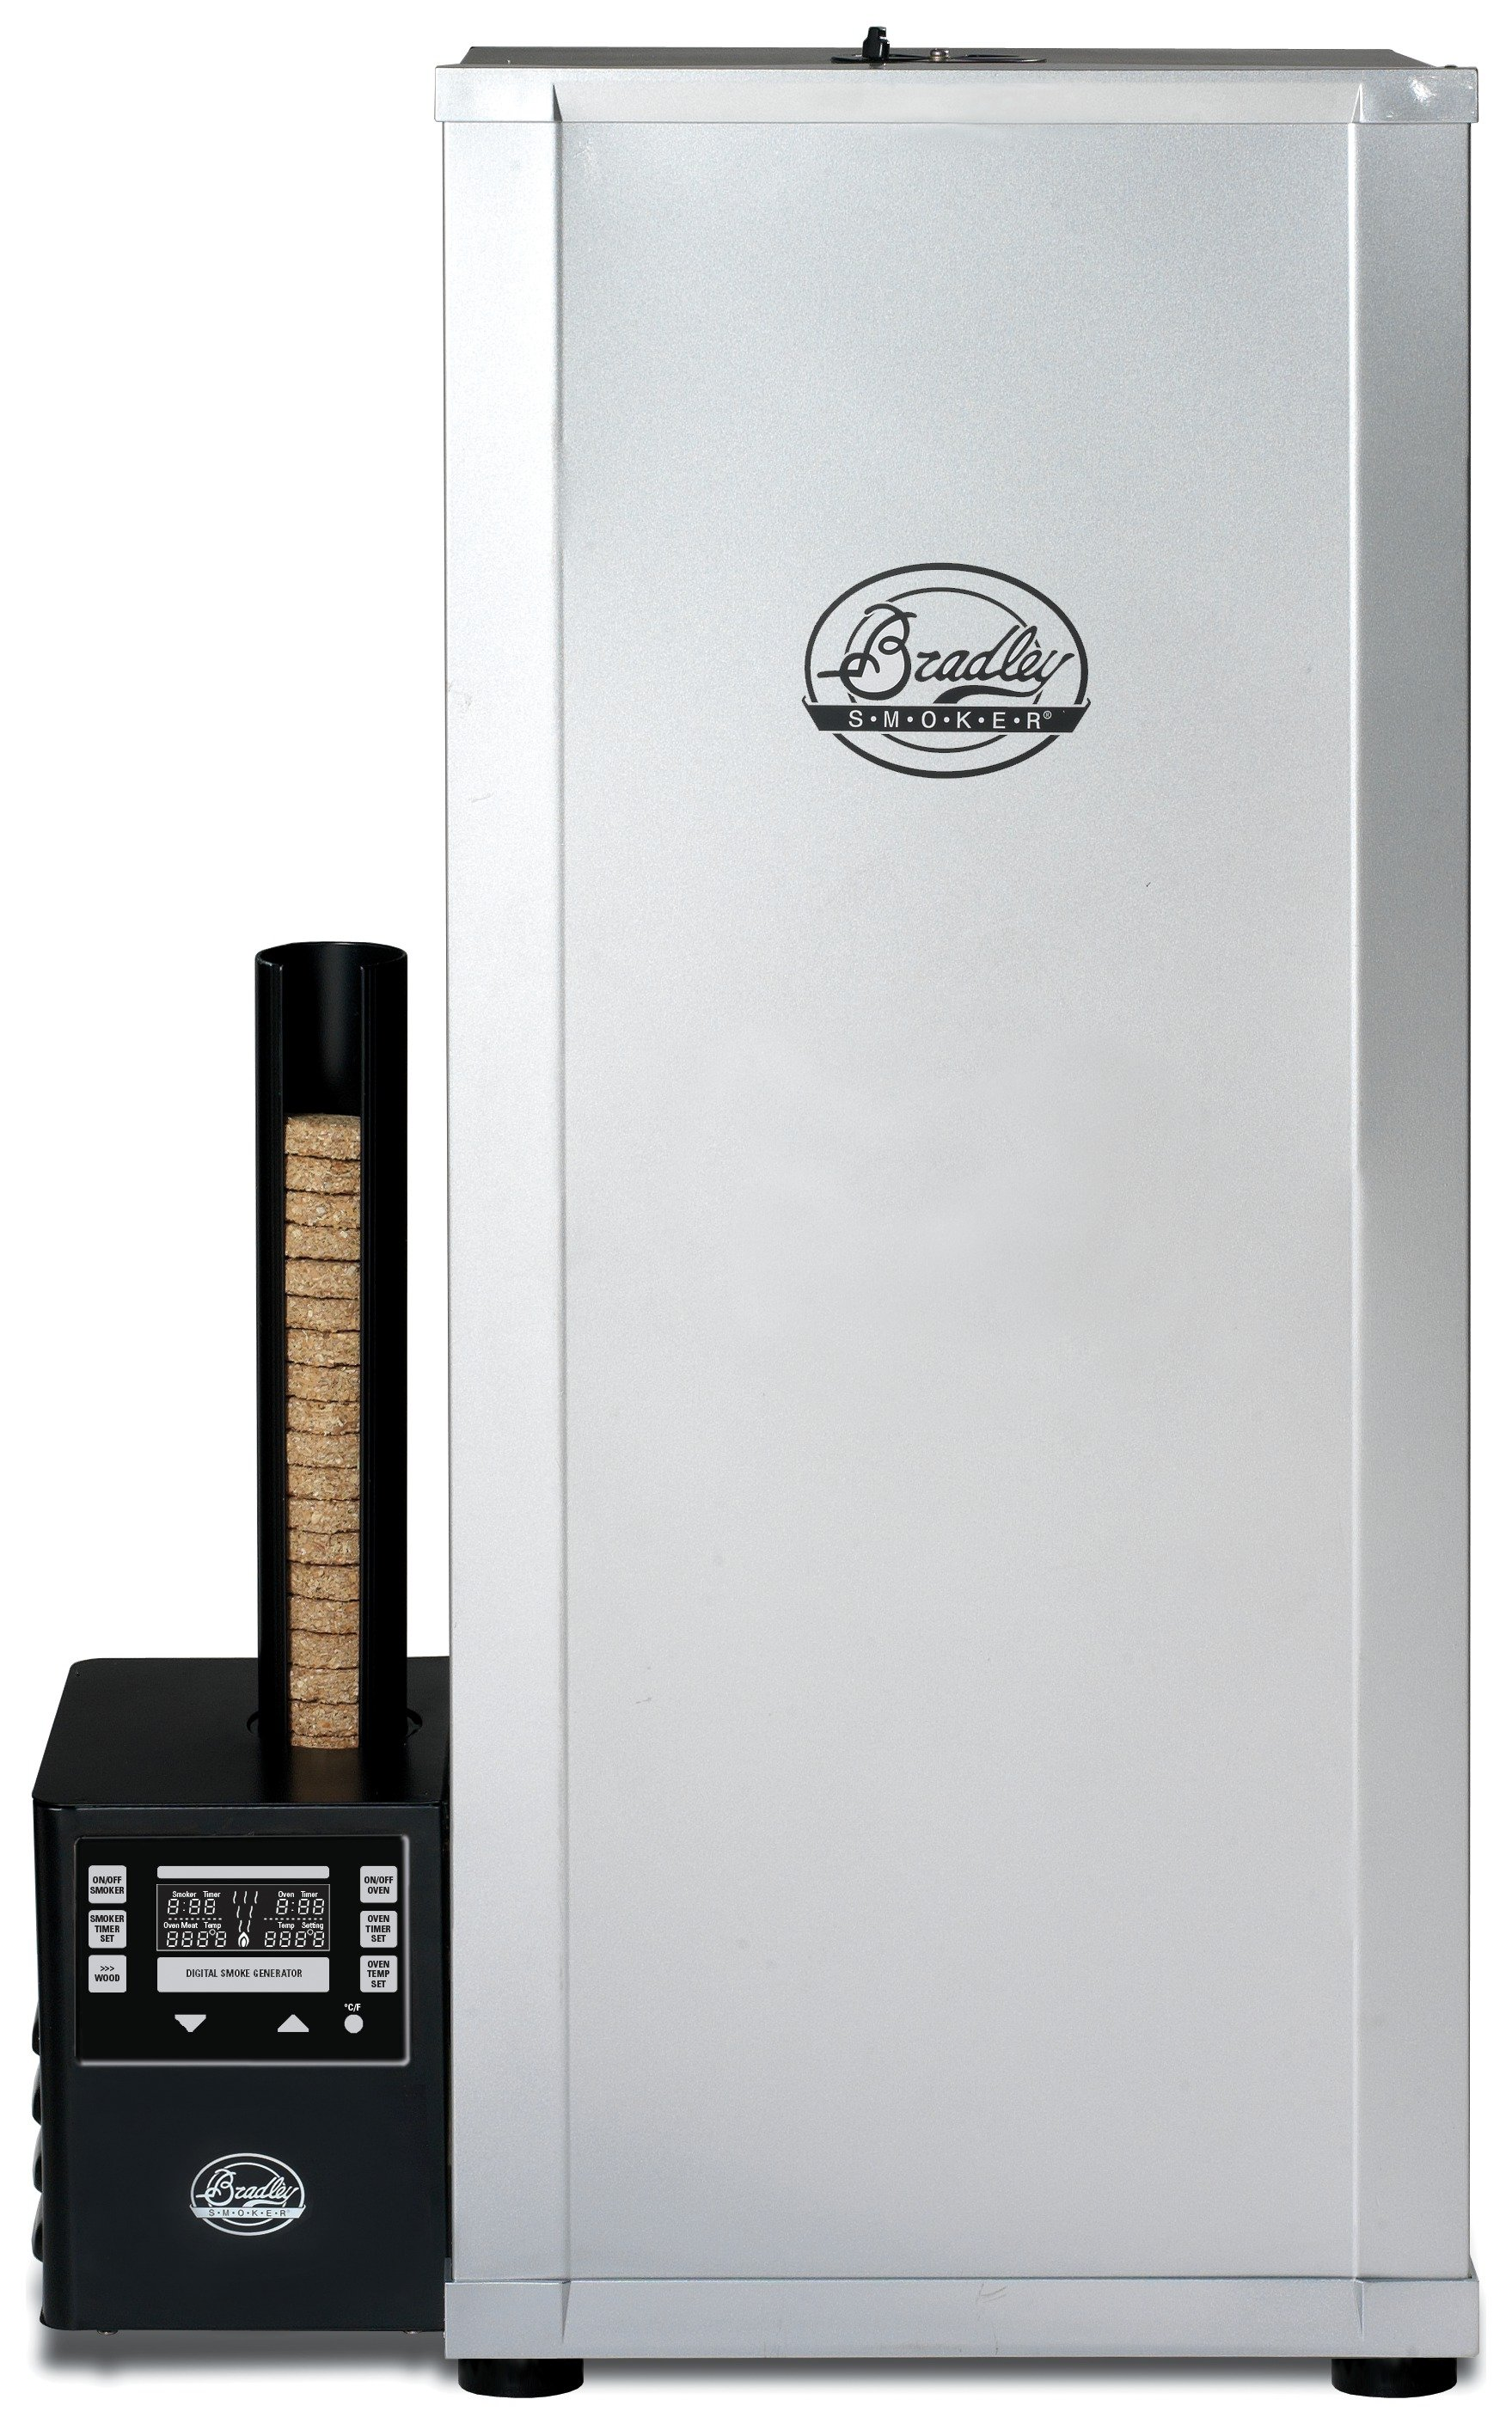 Image of Bradley Smoker BTDS108CE 6 Rack Digital Smoker.